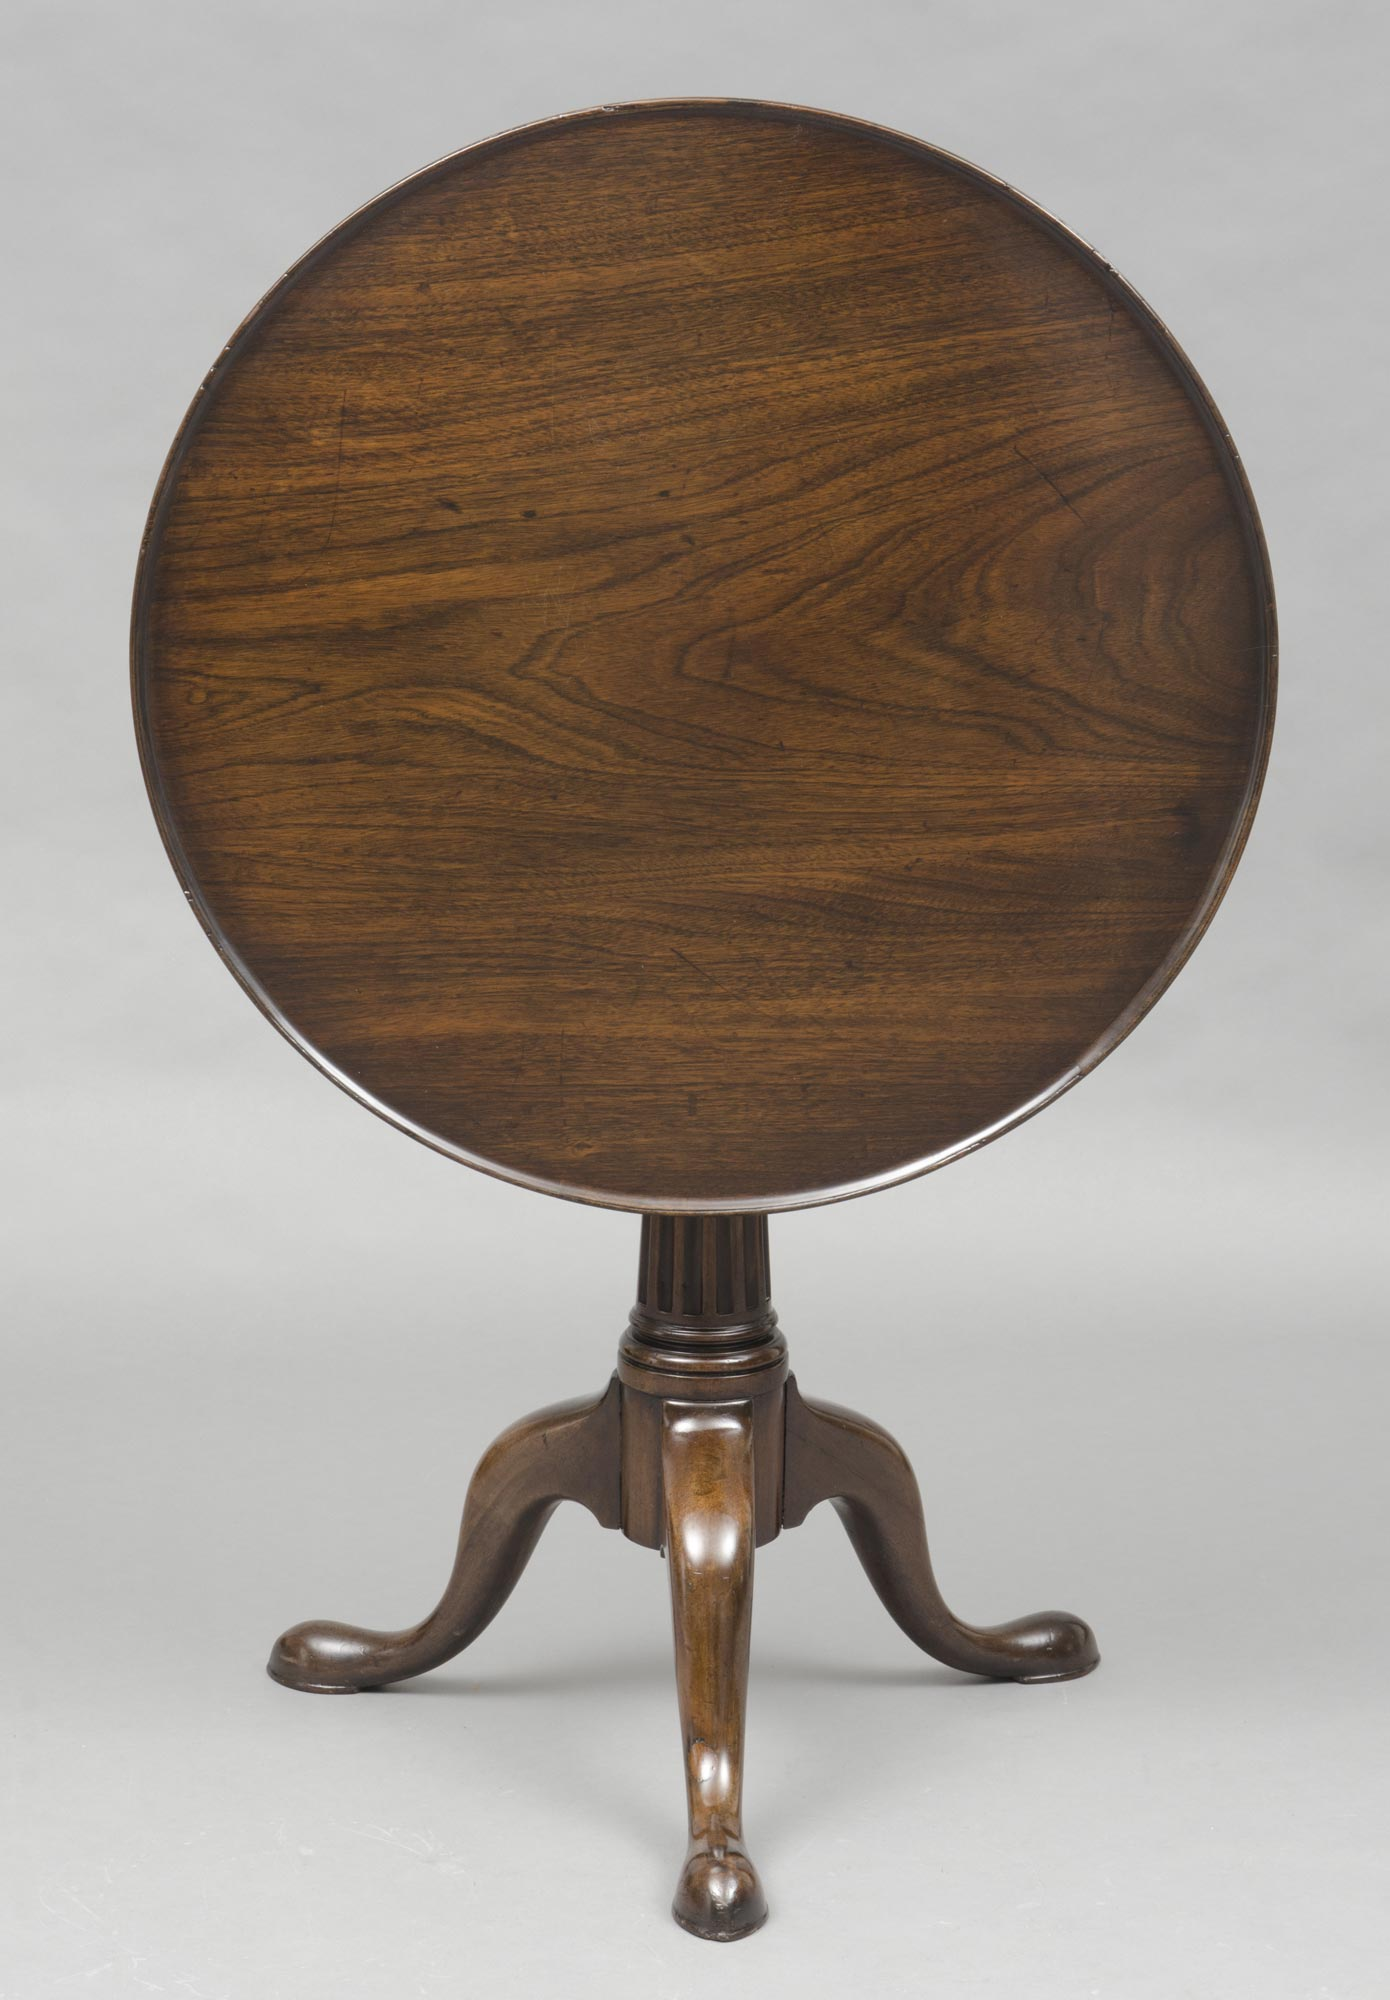 George II Walnut Tripod Tea Table  Circular Antique Tea Tables